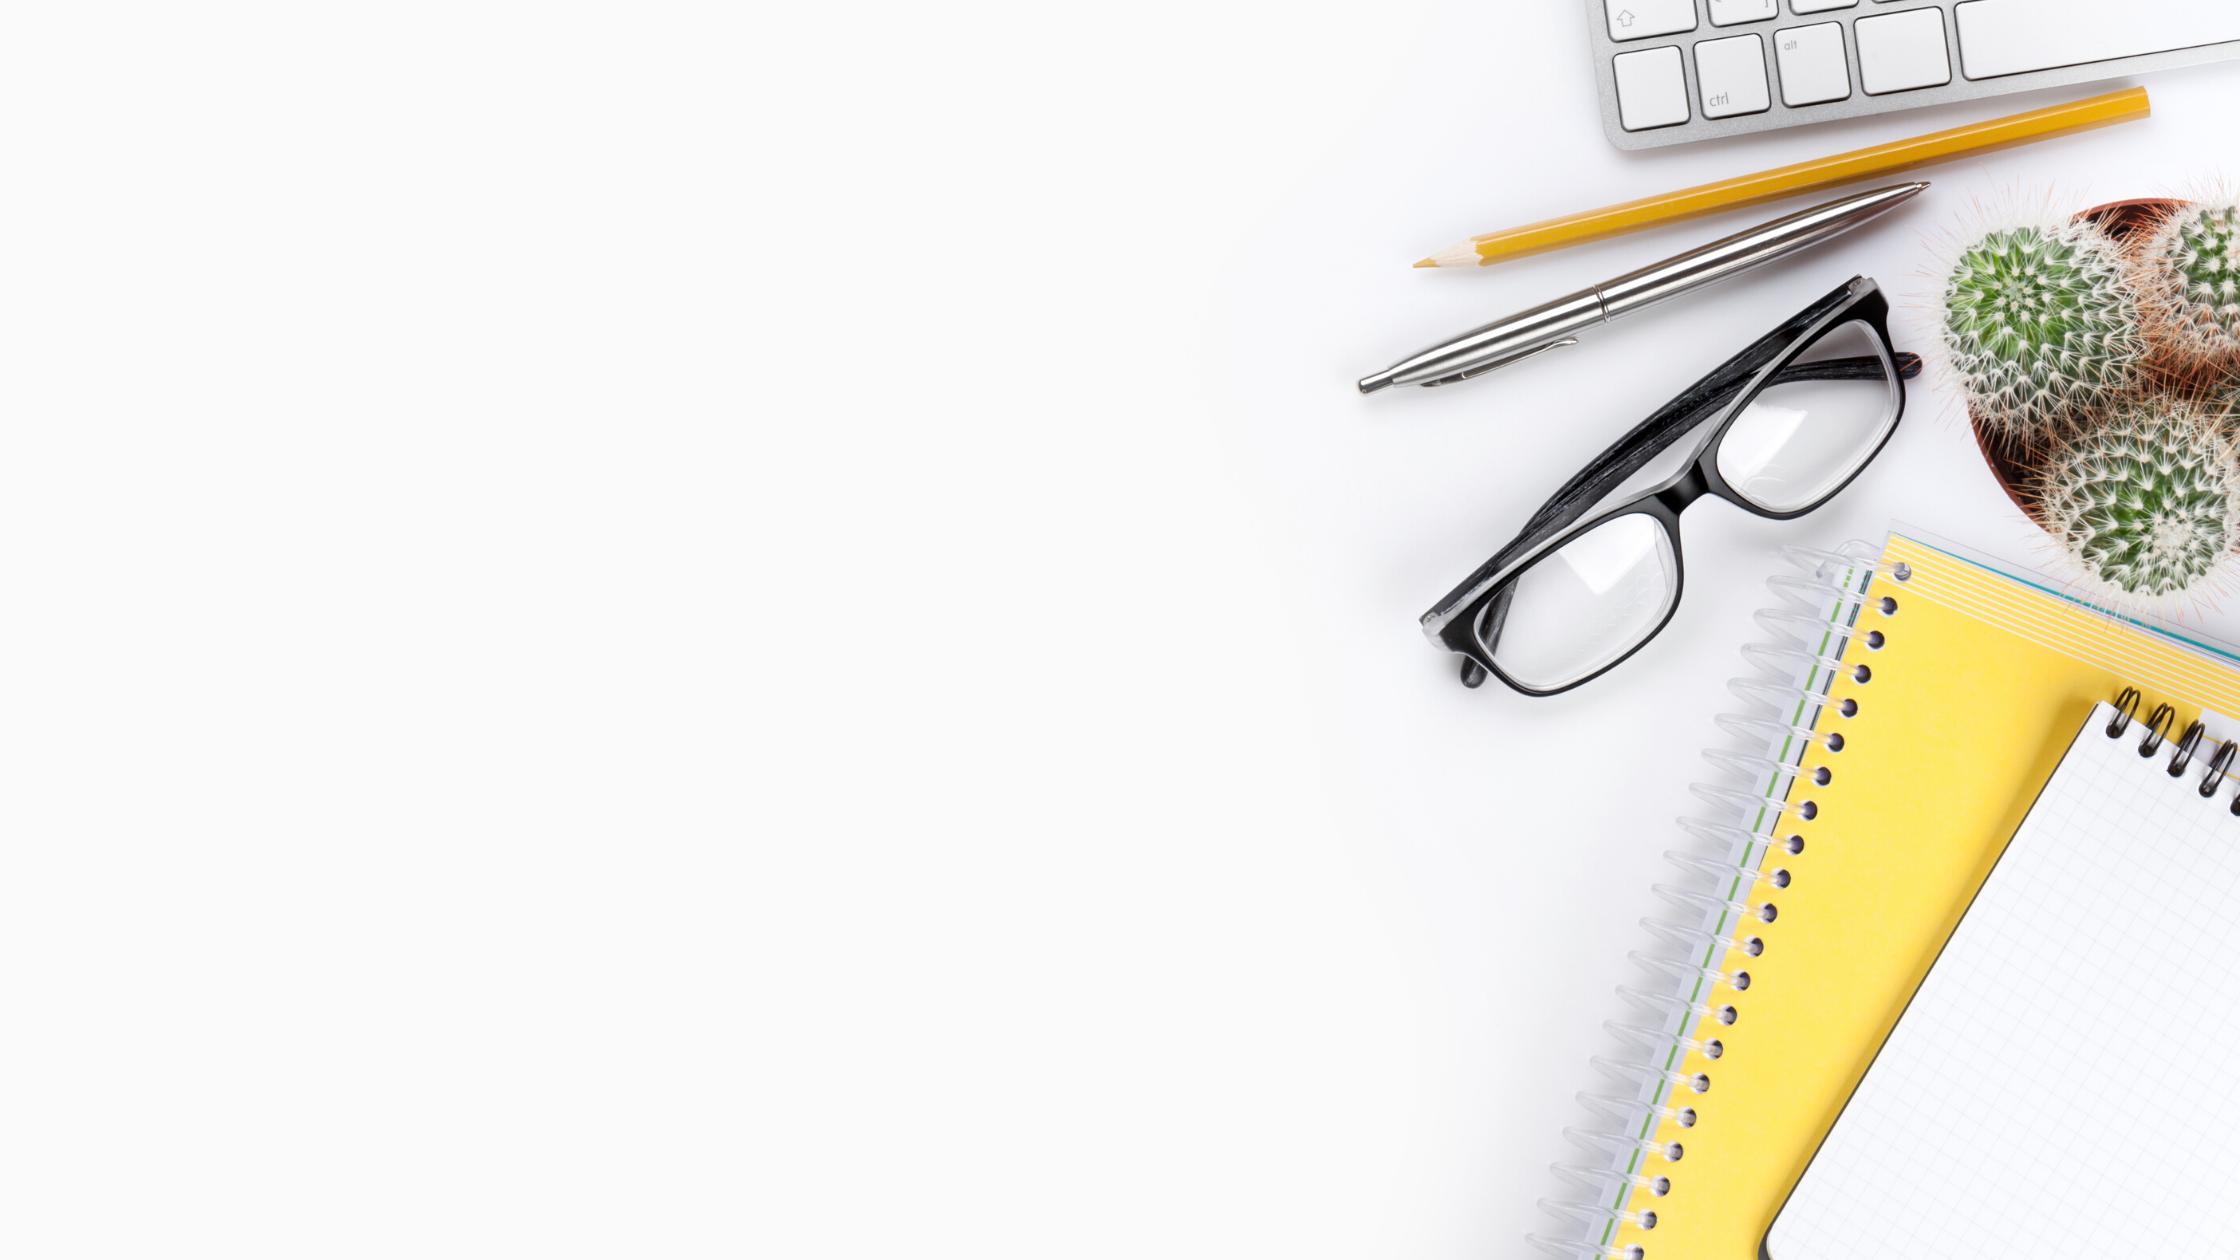 TPT Profitability Course: How to Sell on Teach